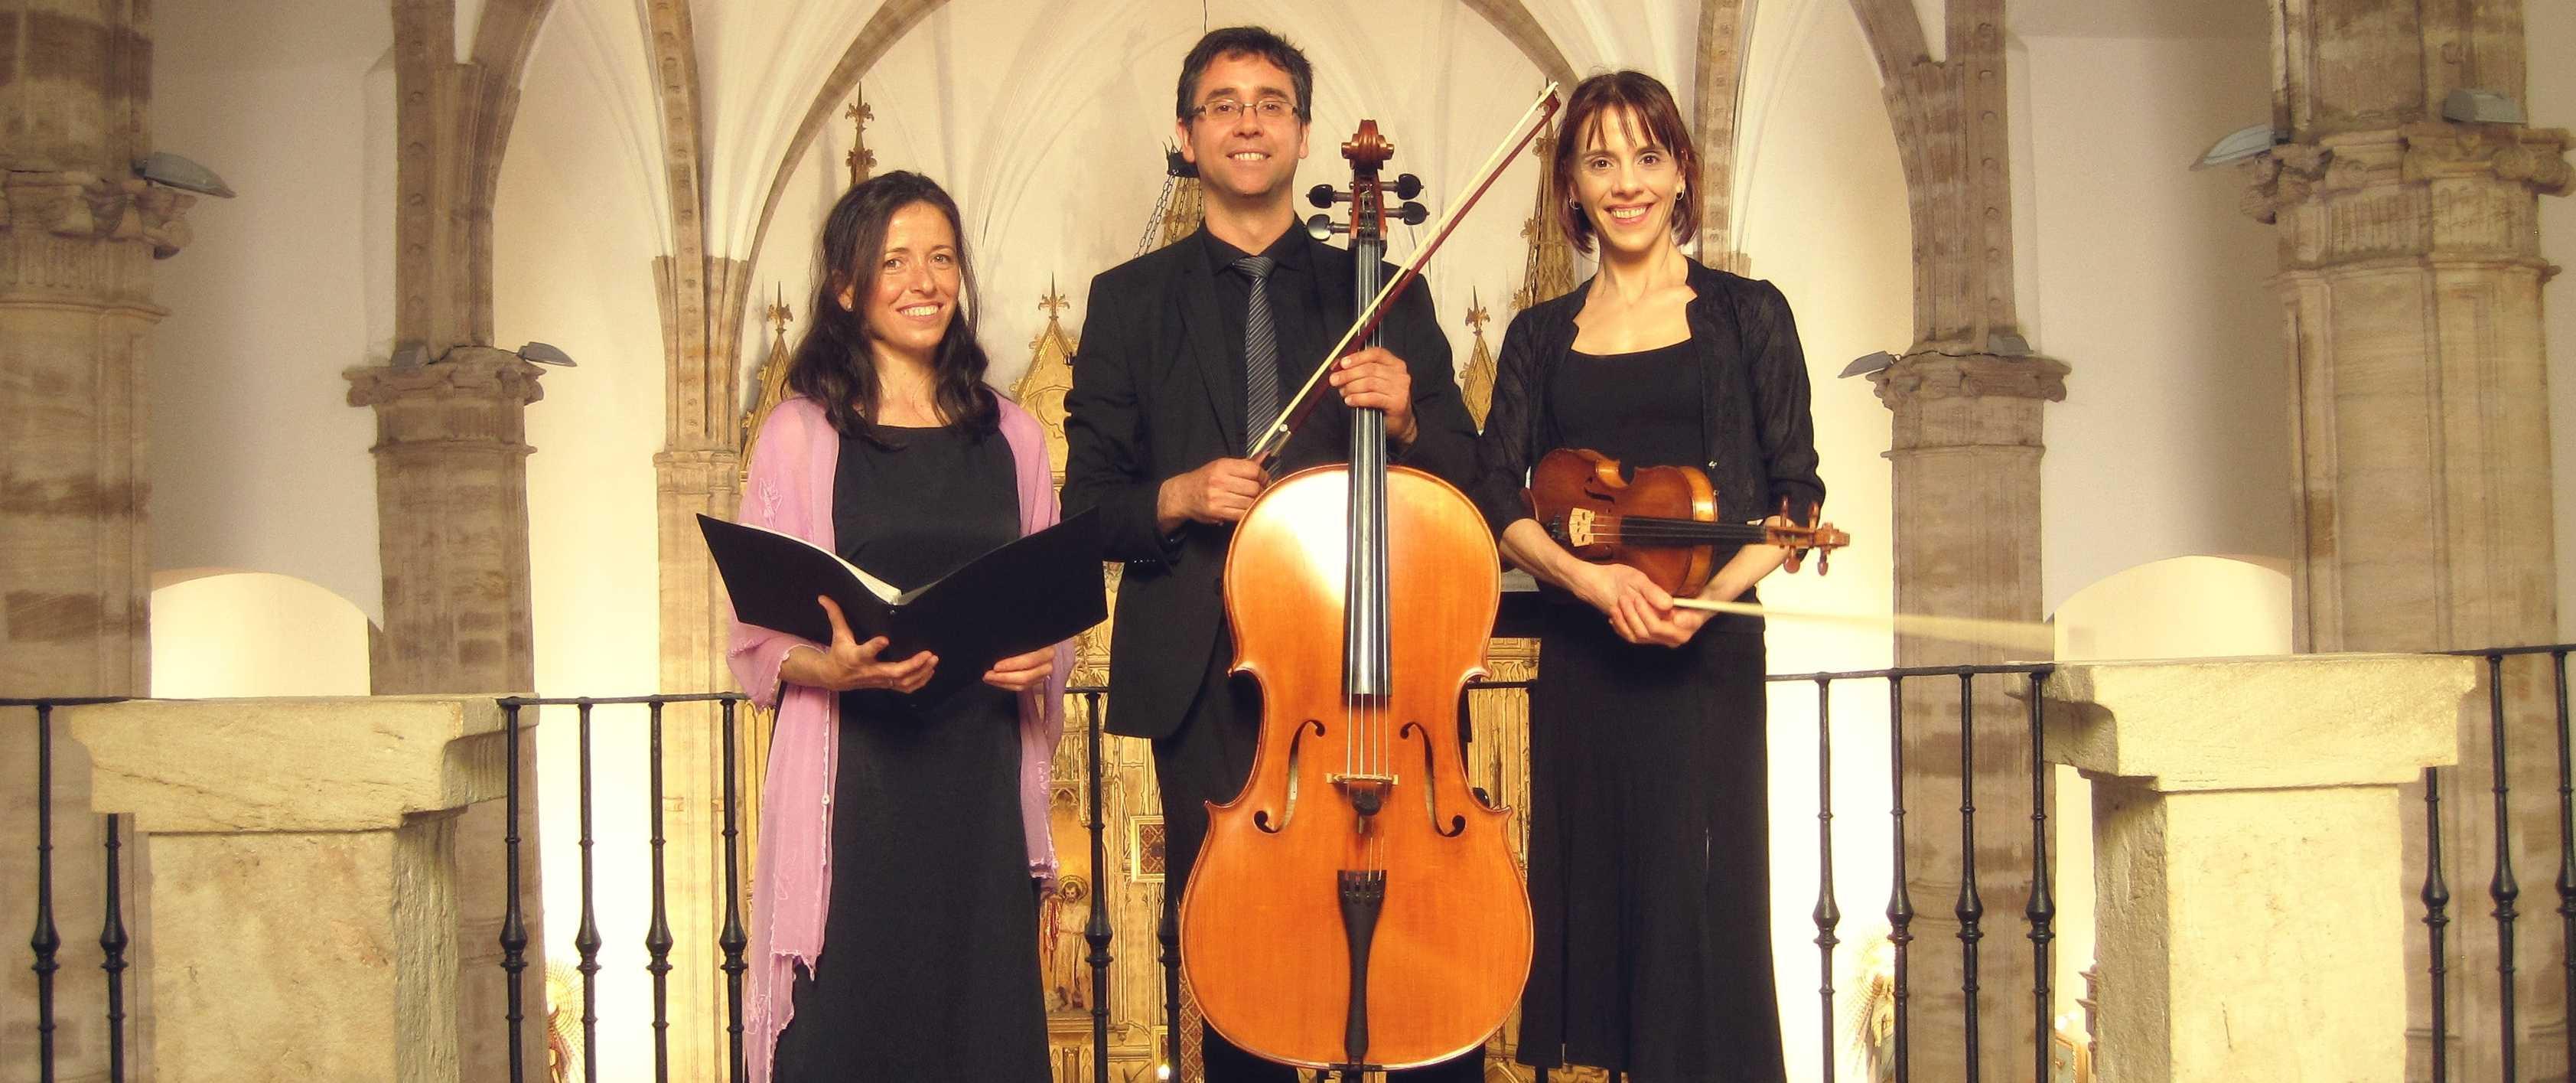 soprano para bodas y violines boda religiosa, soprano para misa de funeral, soprano funerales, soprano ceremonia religiosa